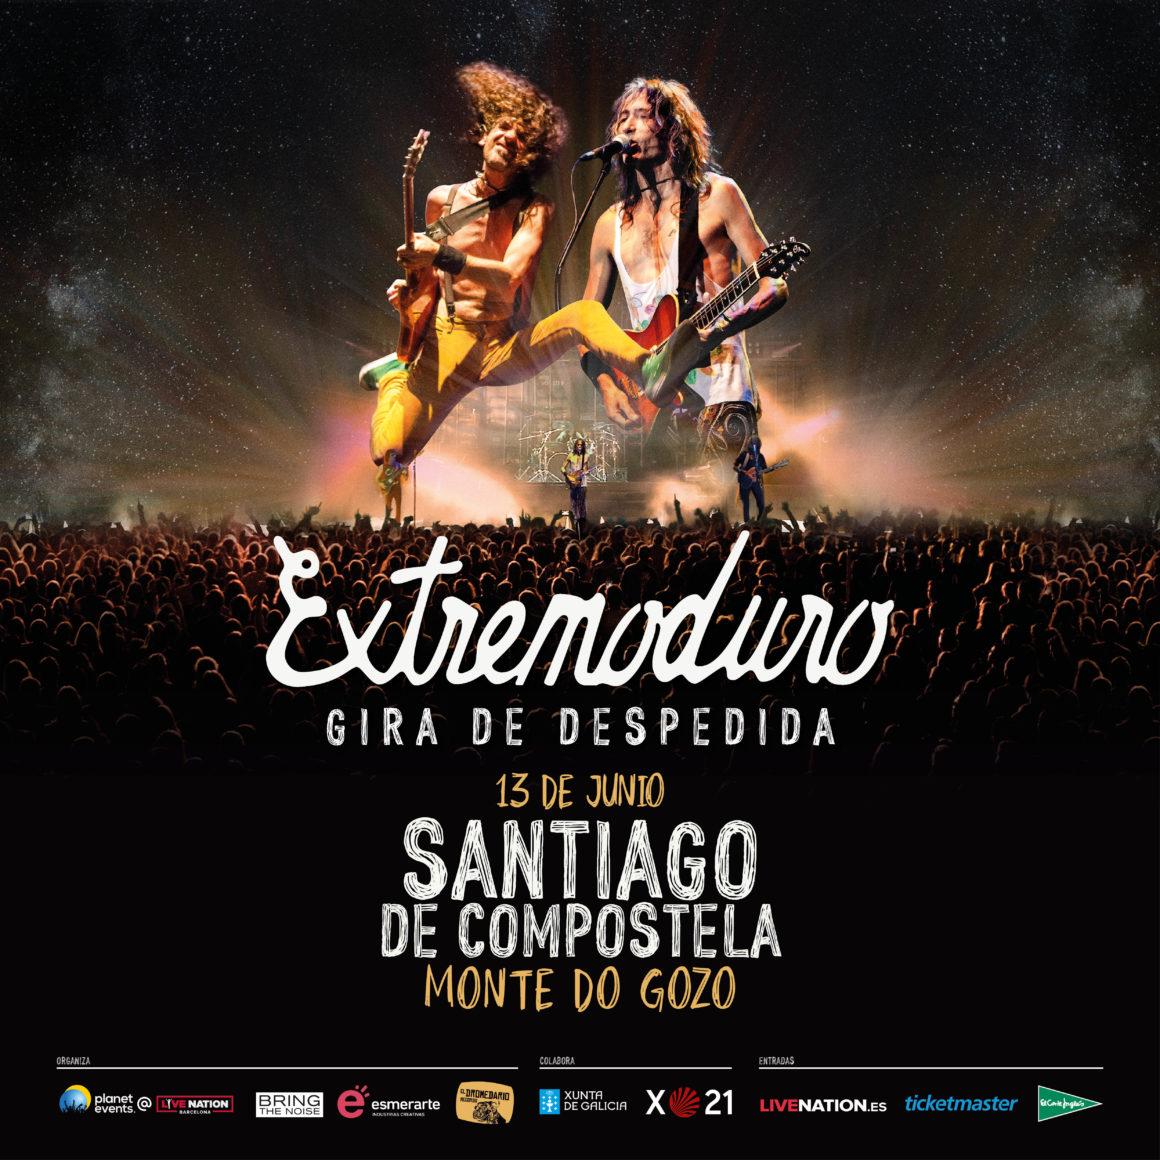 La gira de despedida de Extremoduro pasará por Santiago de Compostela